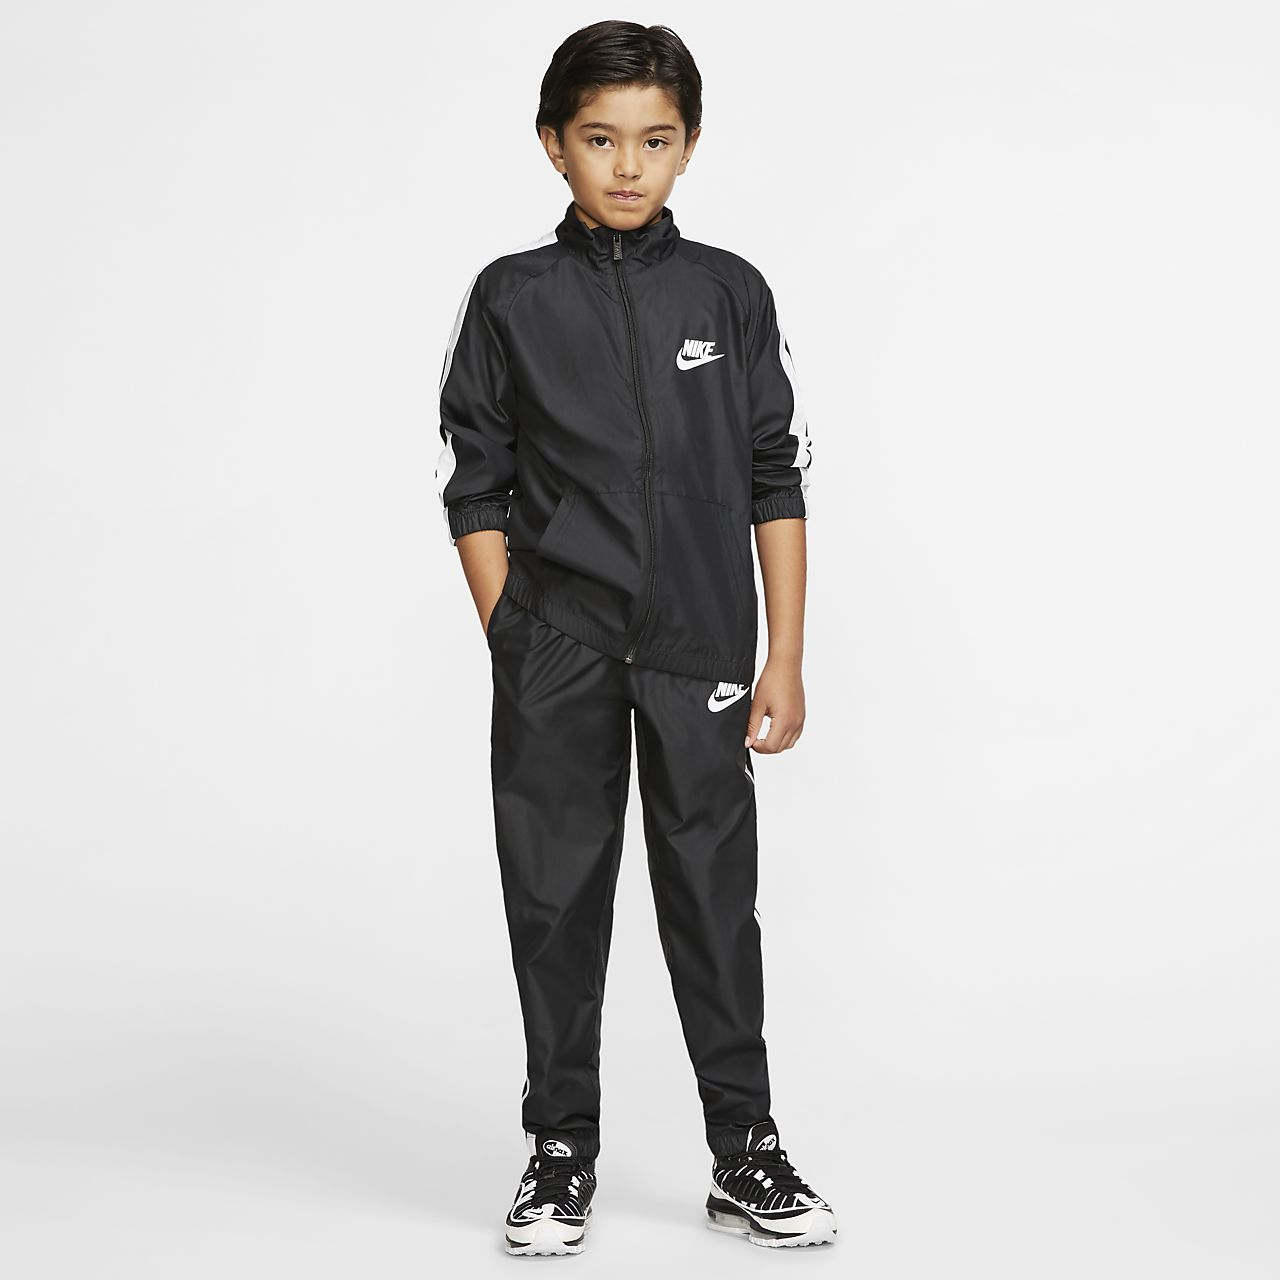 b2a30f158d338 Nike Sportswear Chándal de tejido Woven - Niño a. Nike.com ES